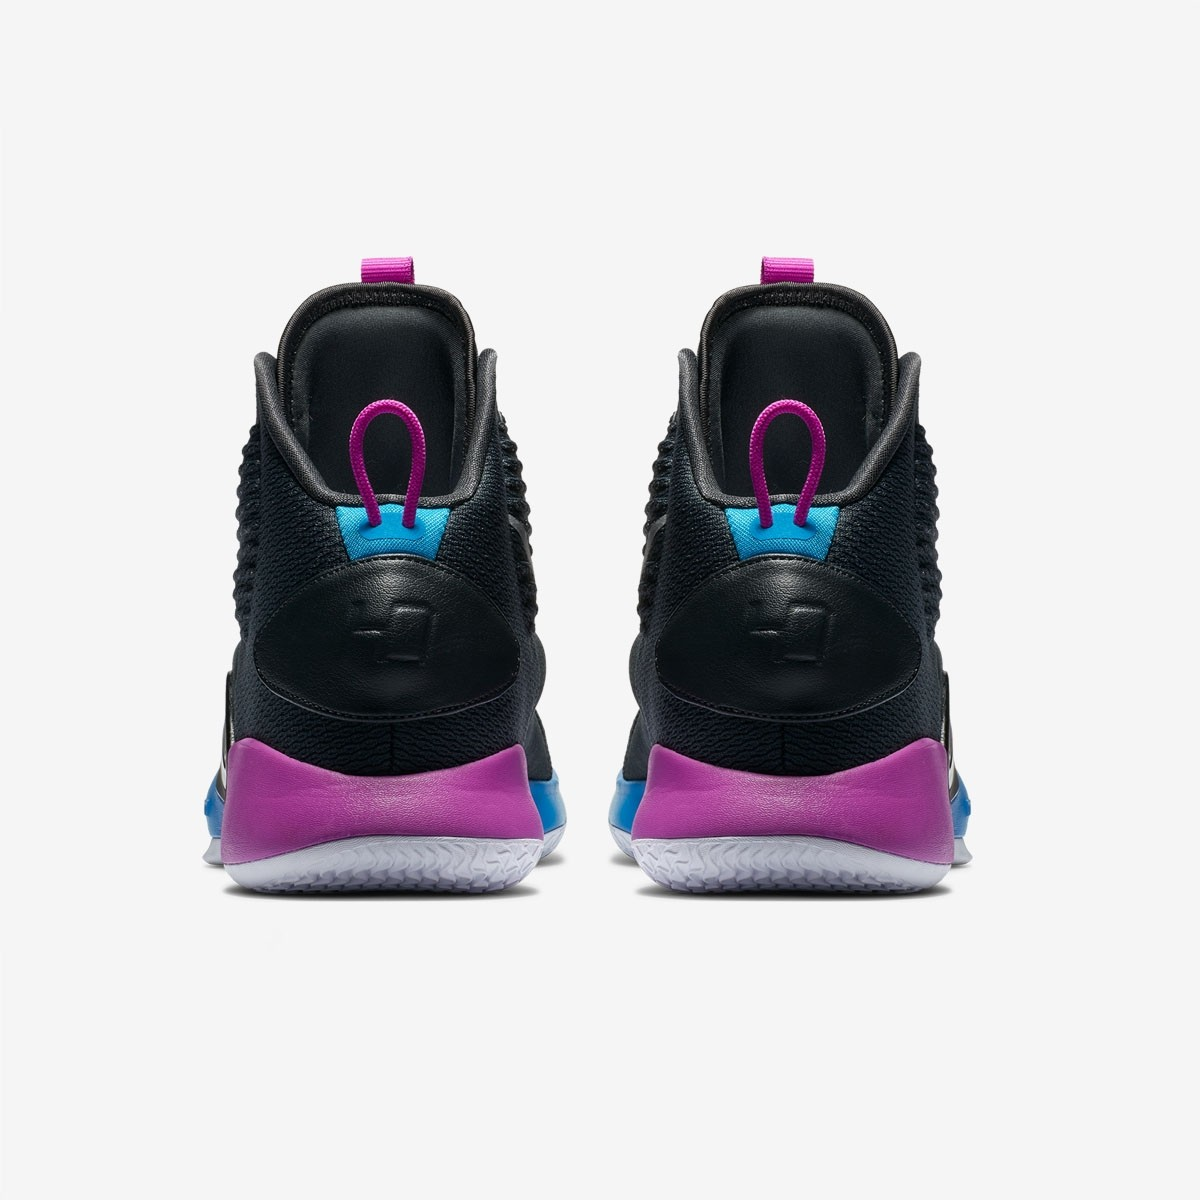 Nike Hyperdunk X 2018 'Huarache' AO7893-002